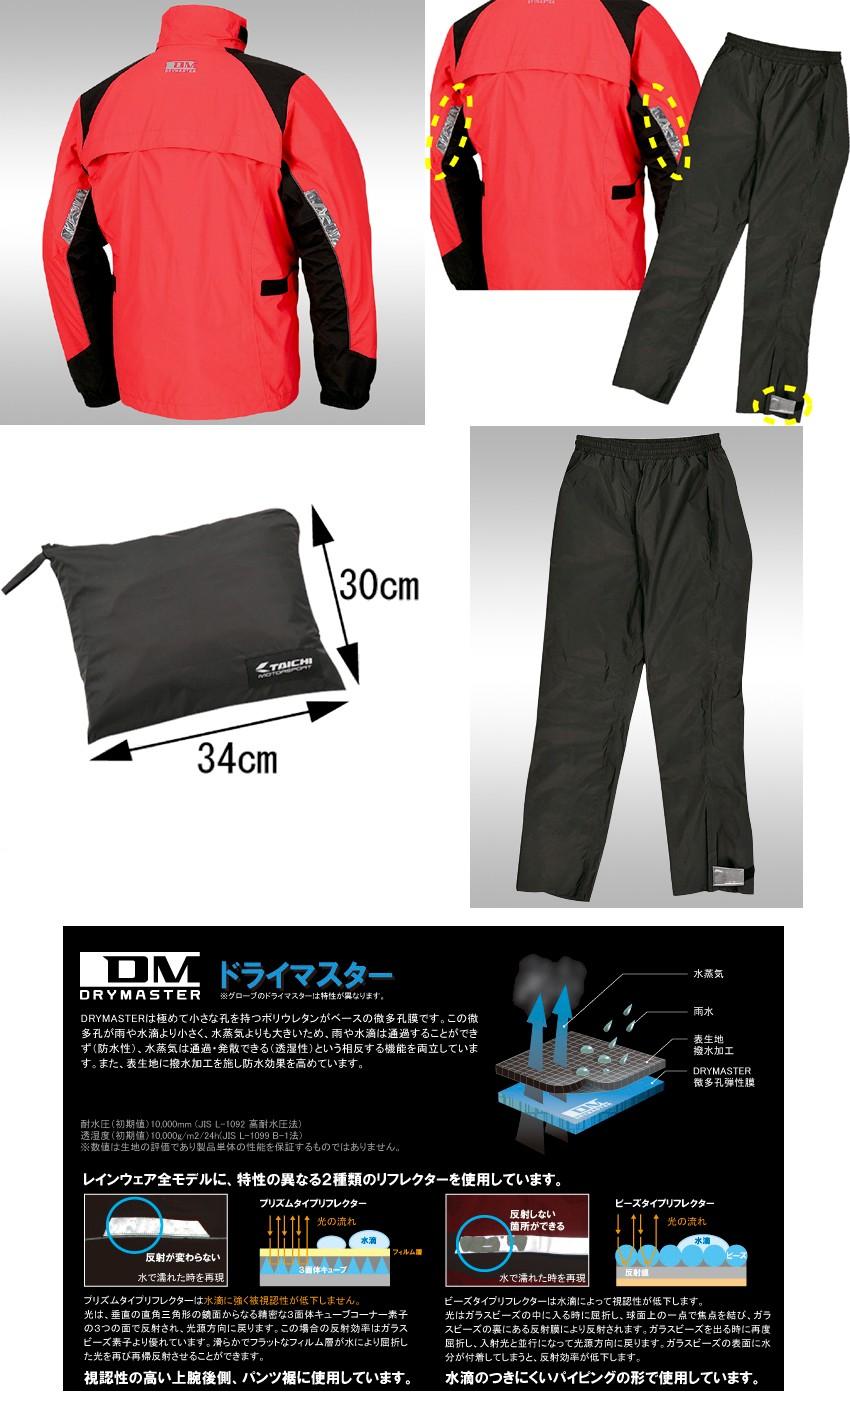 【RS TAICHI】DRYMASTER 成套雨衣 - 「Webike-摩托百貨」